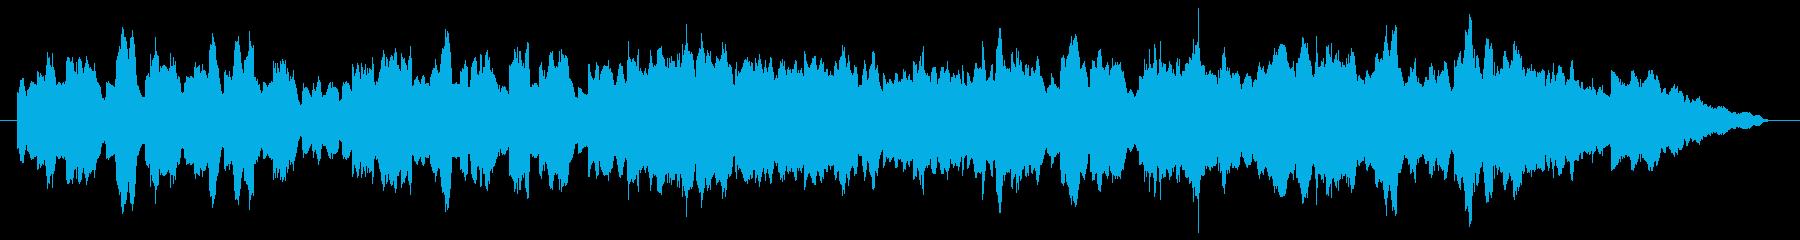 music box 2の再生済みの波形